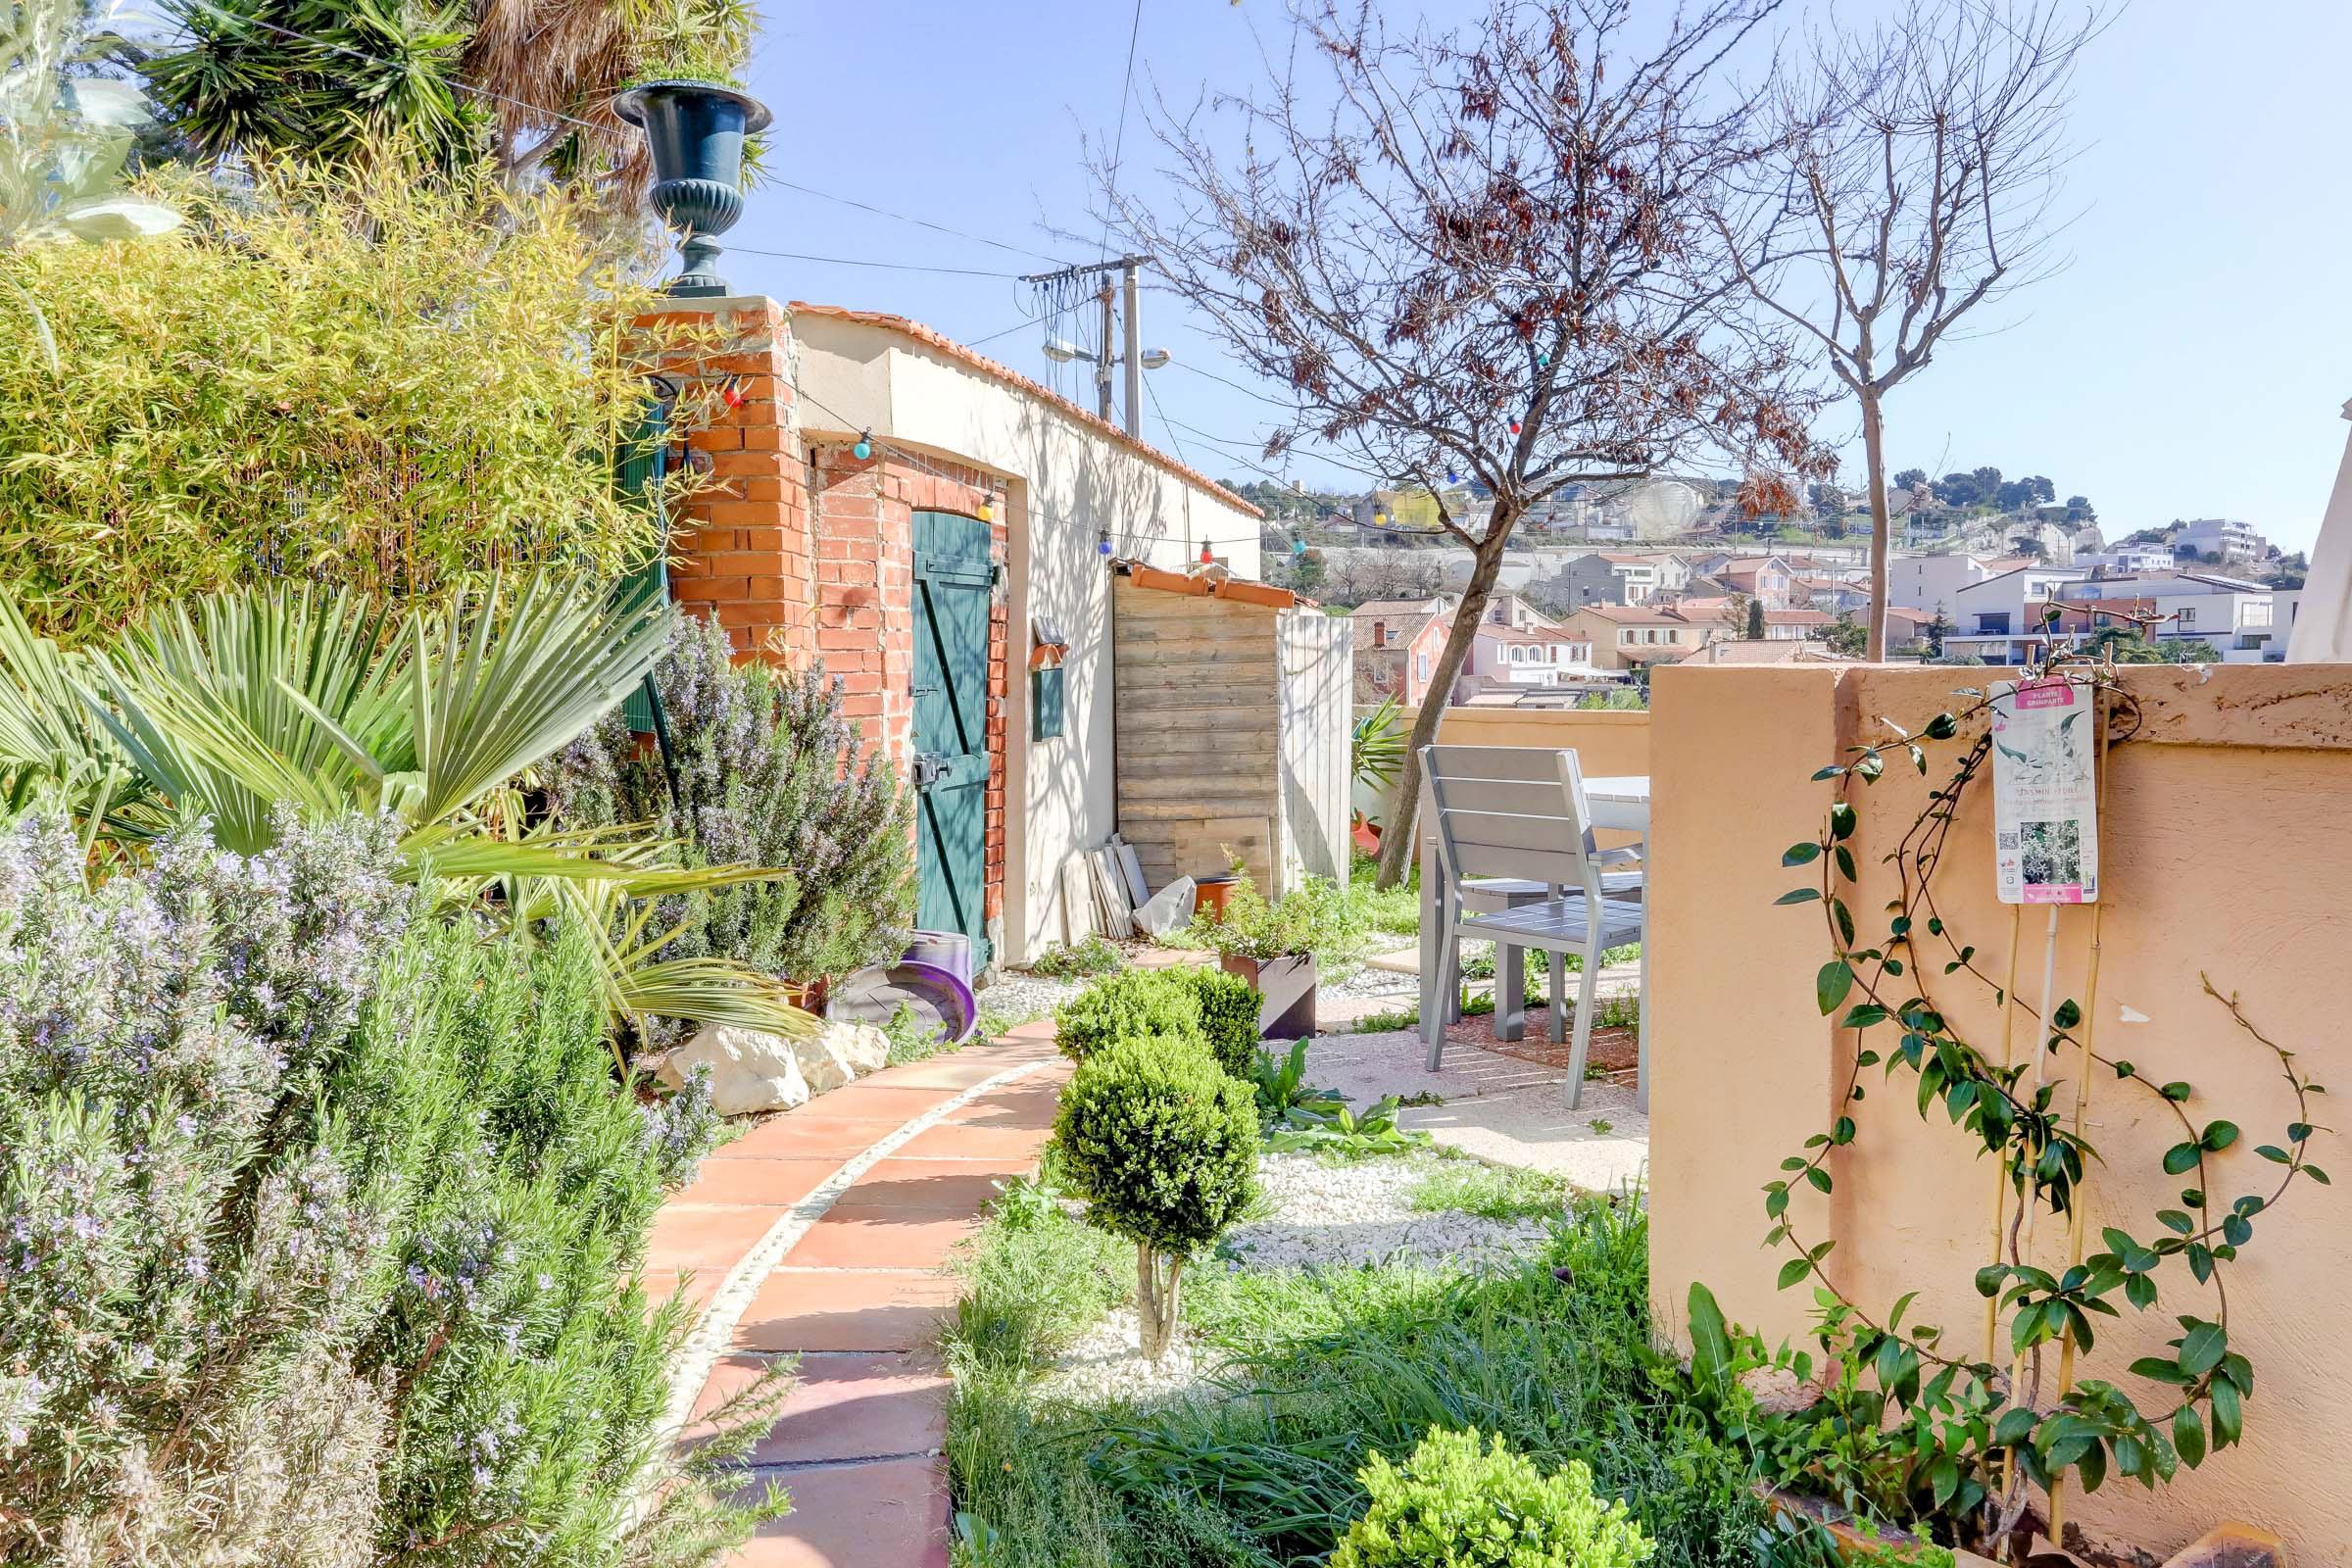 Maison panorama l 39 estaque ma terrasse marseille - Terrasse jardin londrina quadra marseille ...